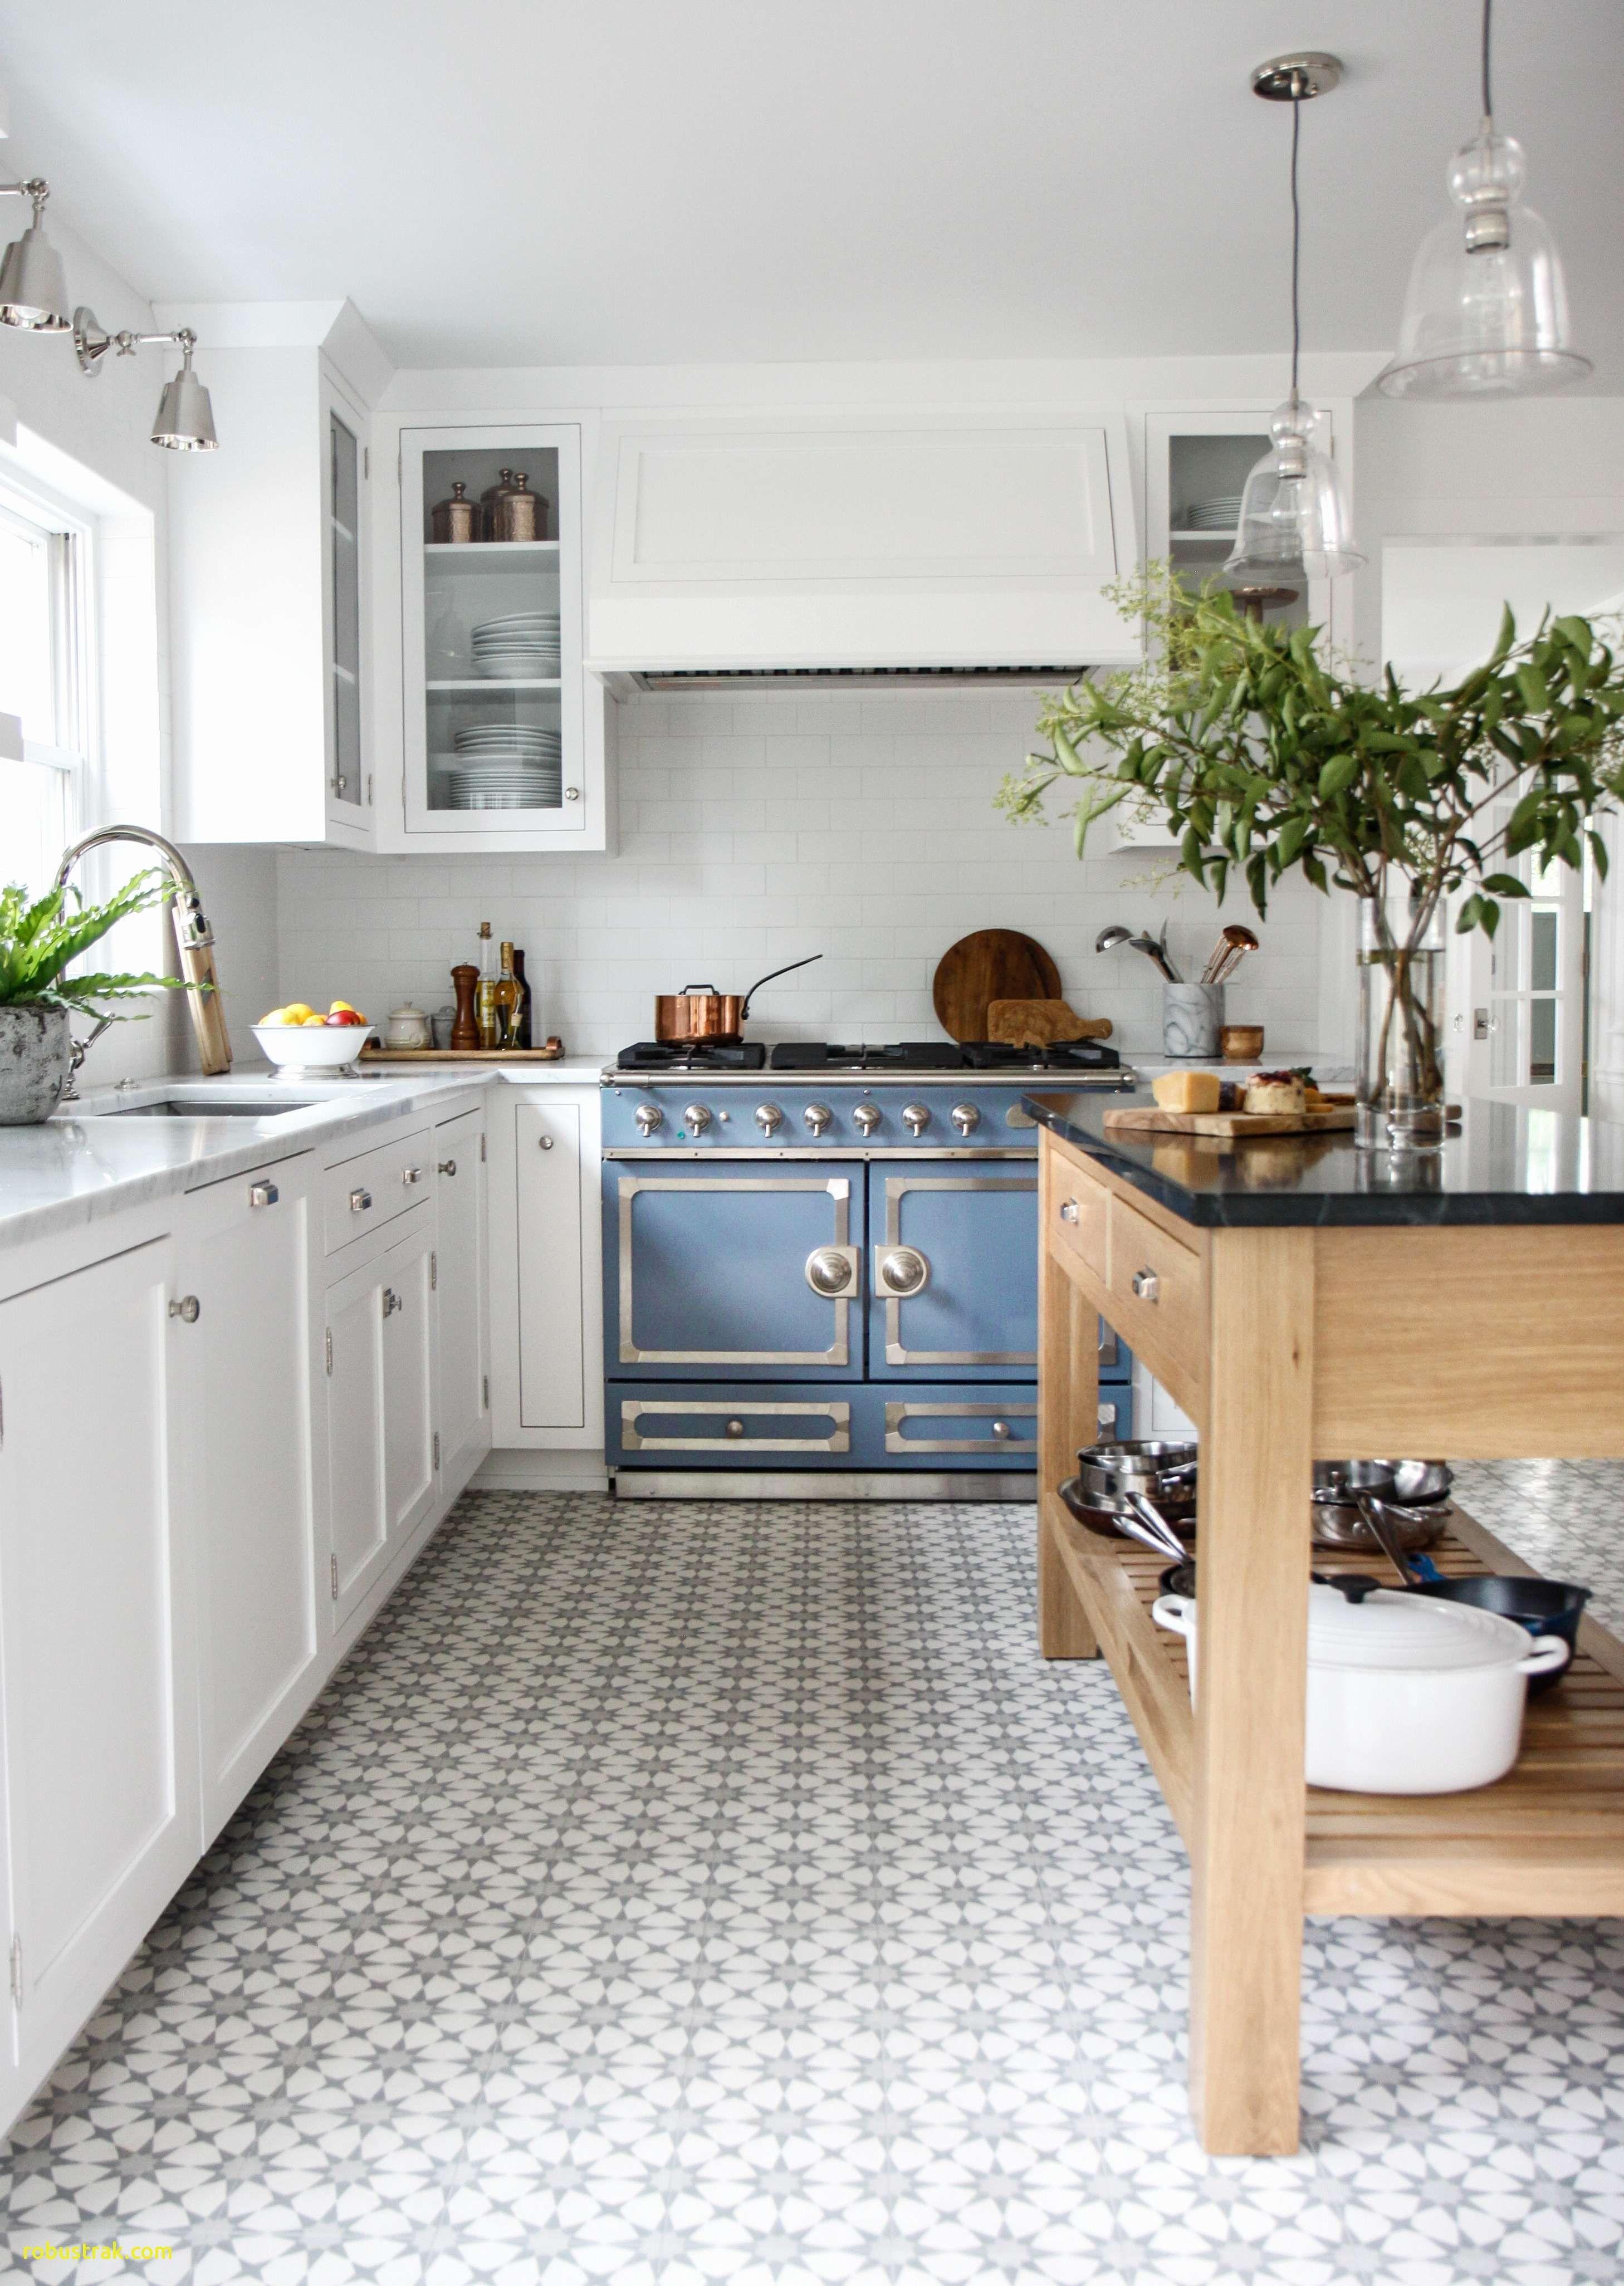 Houzz Kitchen Backsplash Tile Download Luxury Backsplash For White Kitchen Cabinets From Houzz Kit In 2020 Kitchen Design Small White Kitchen Design Kitchen Floor Tile